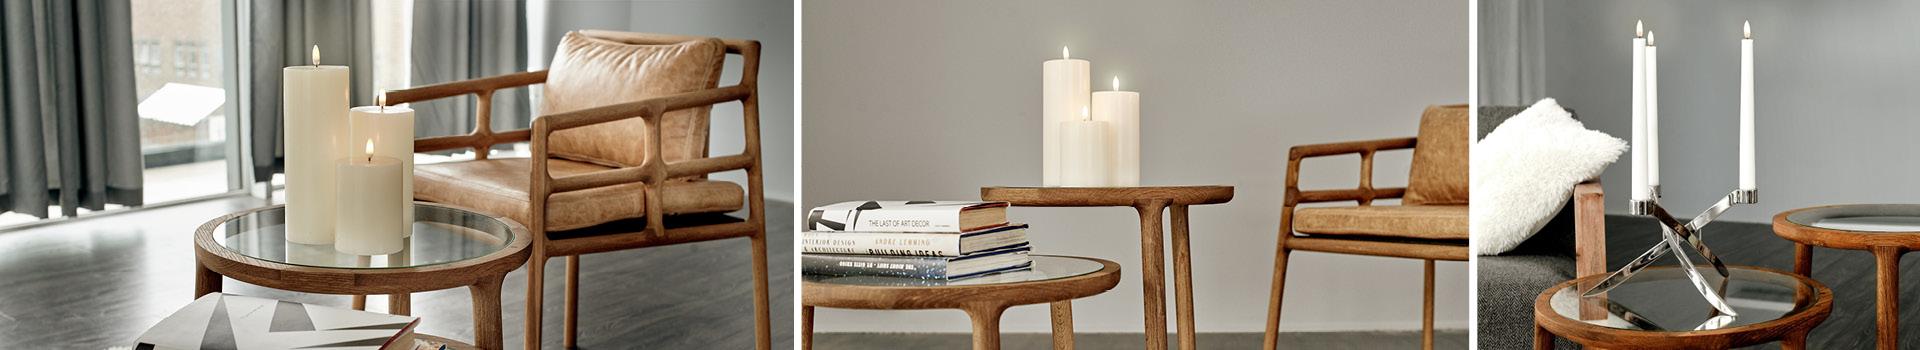 Uyuni-lighting-led-lys-elektriske-kubbelys.jpg